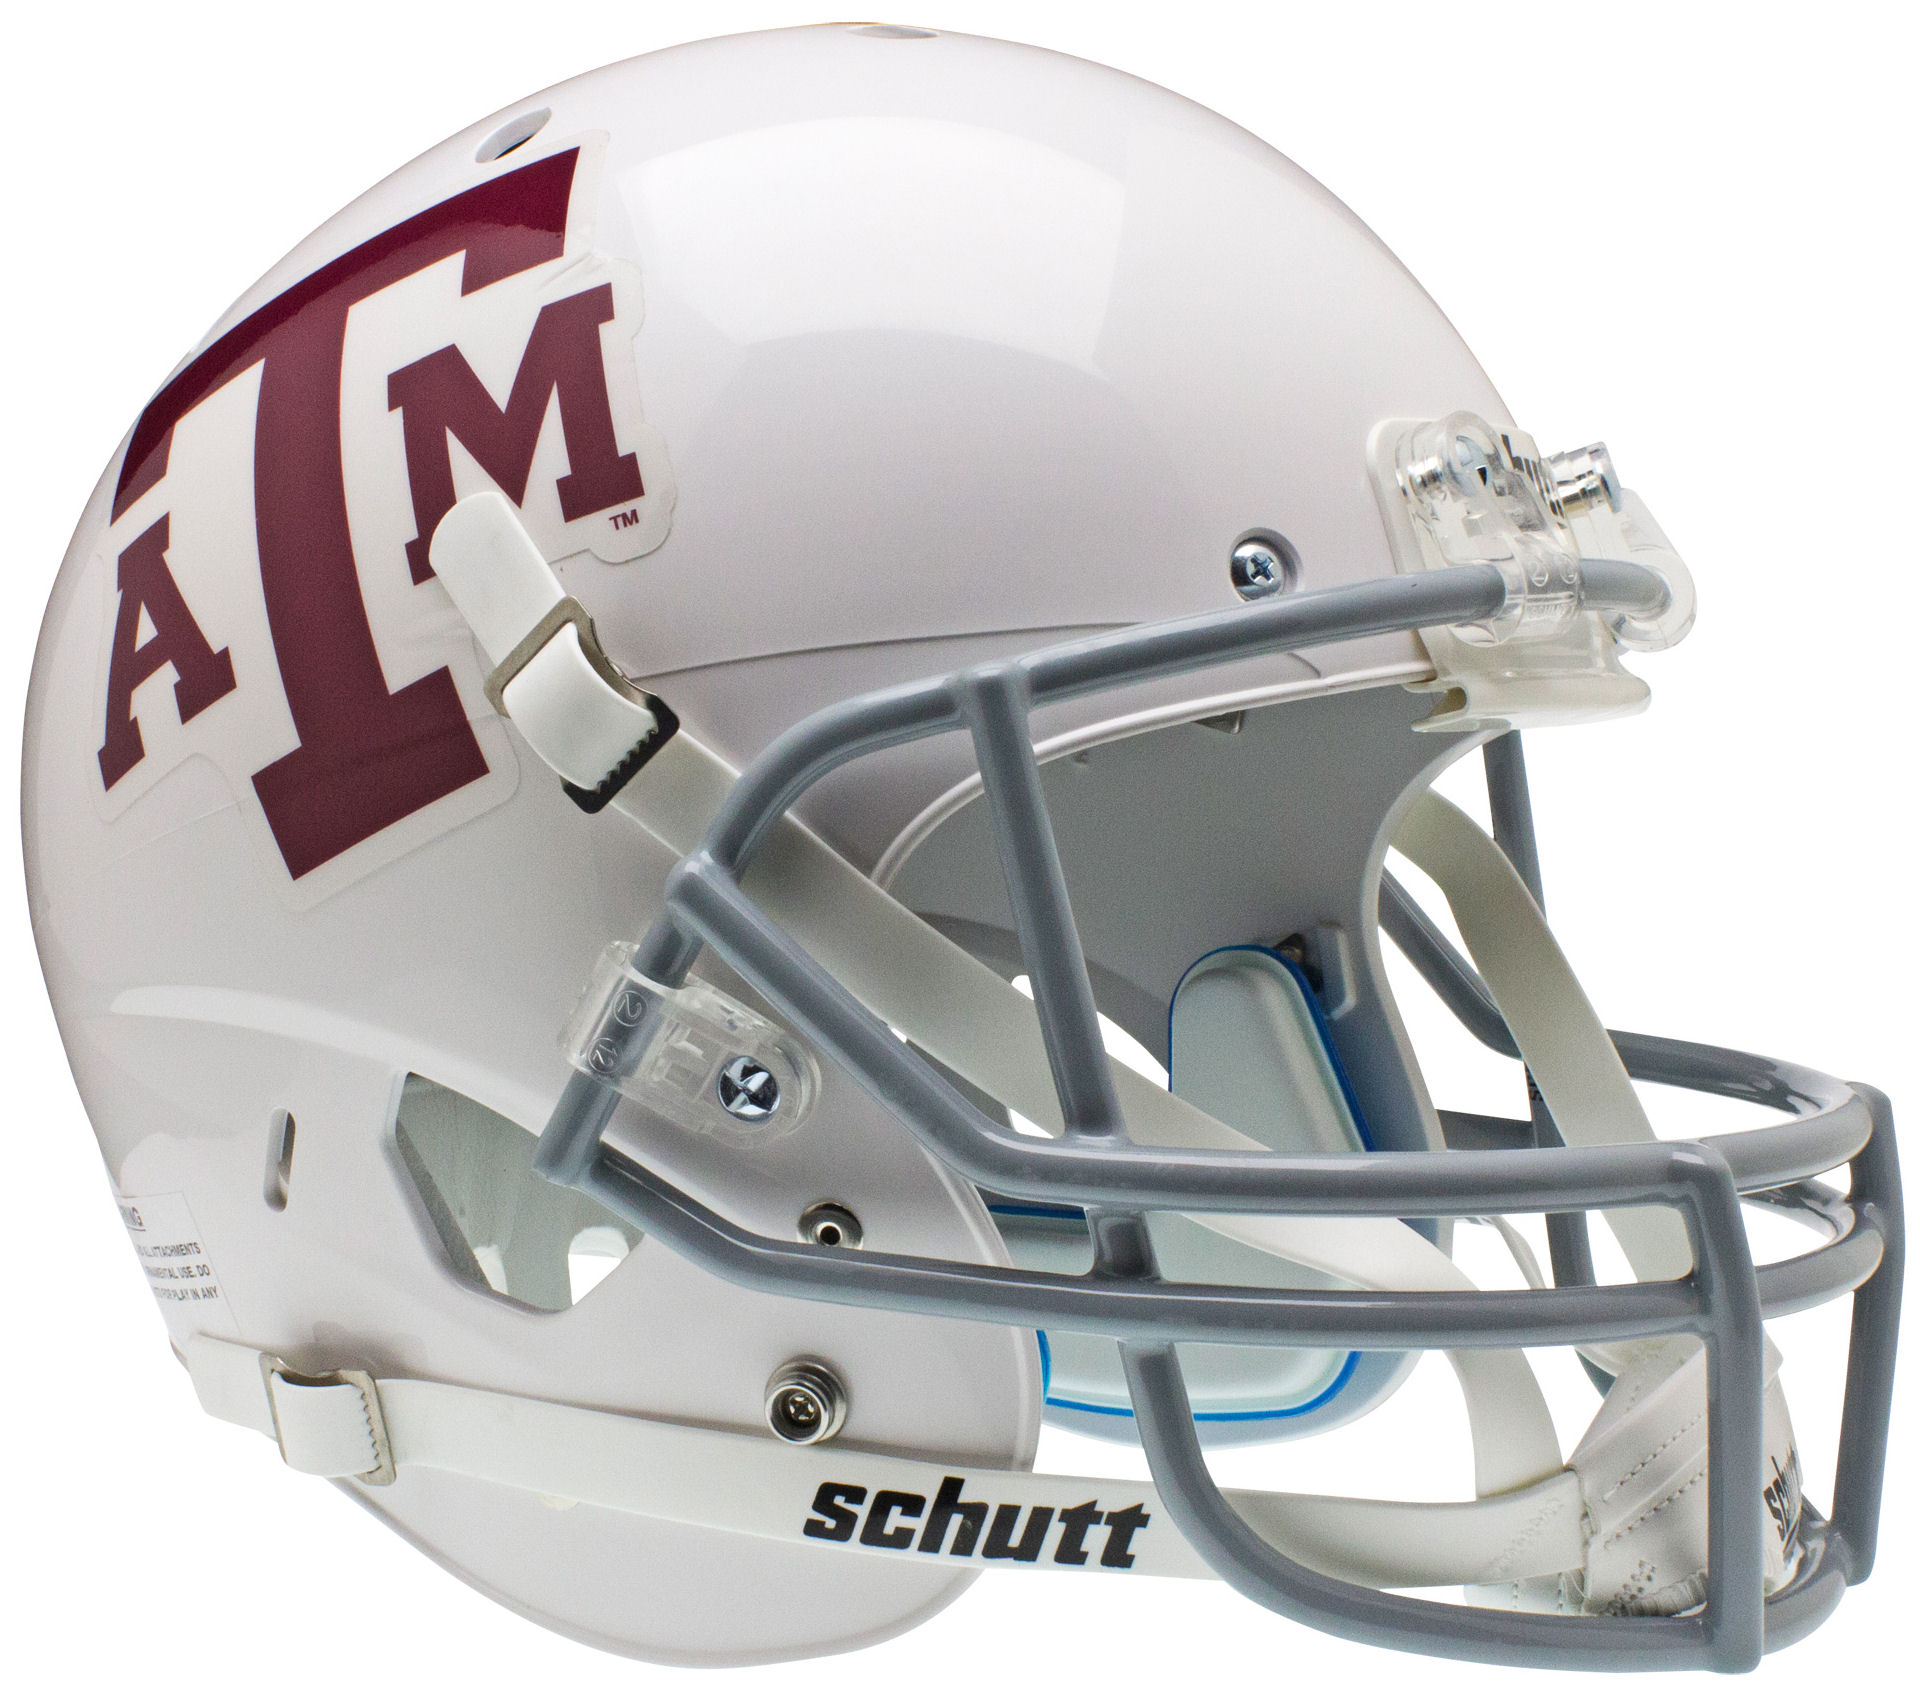 Texas A&M Aggies Full XP Replica Football Helmet Schutt <B>White Gray Mask</B>